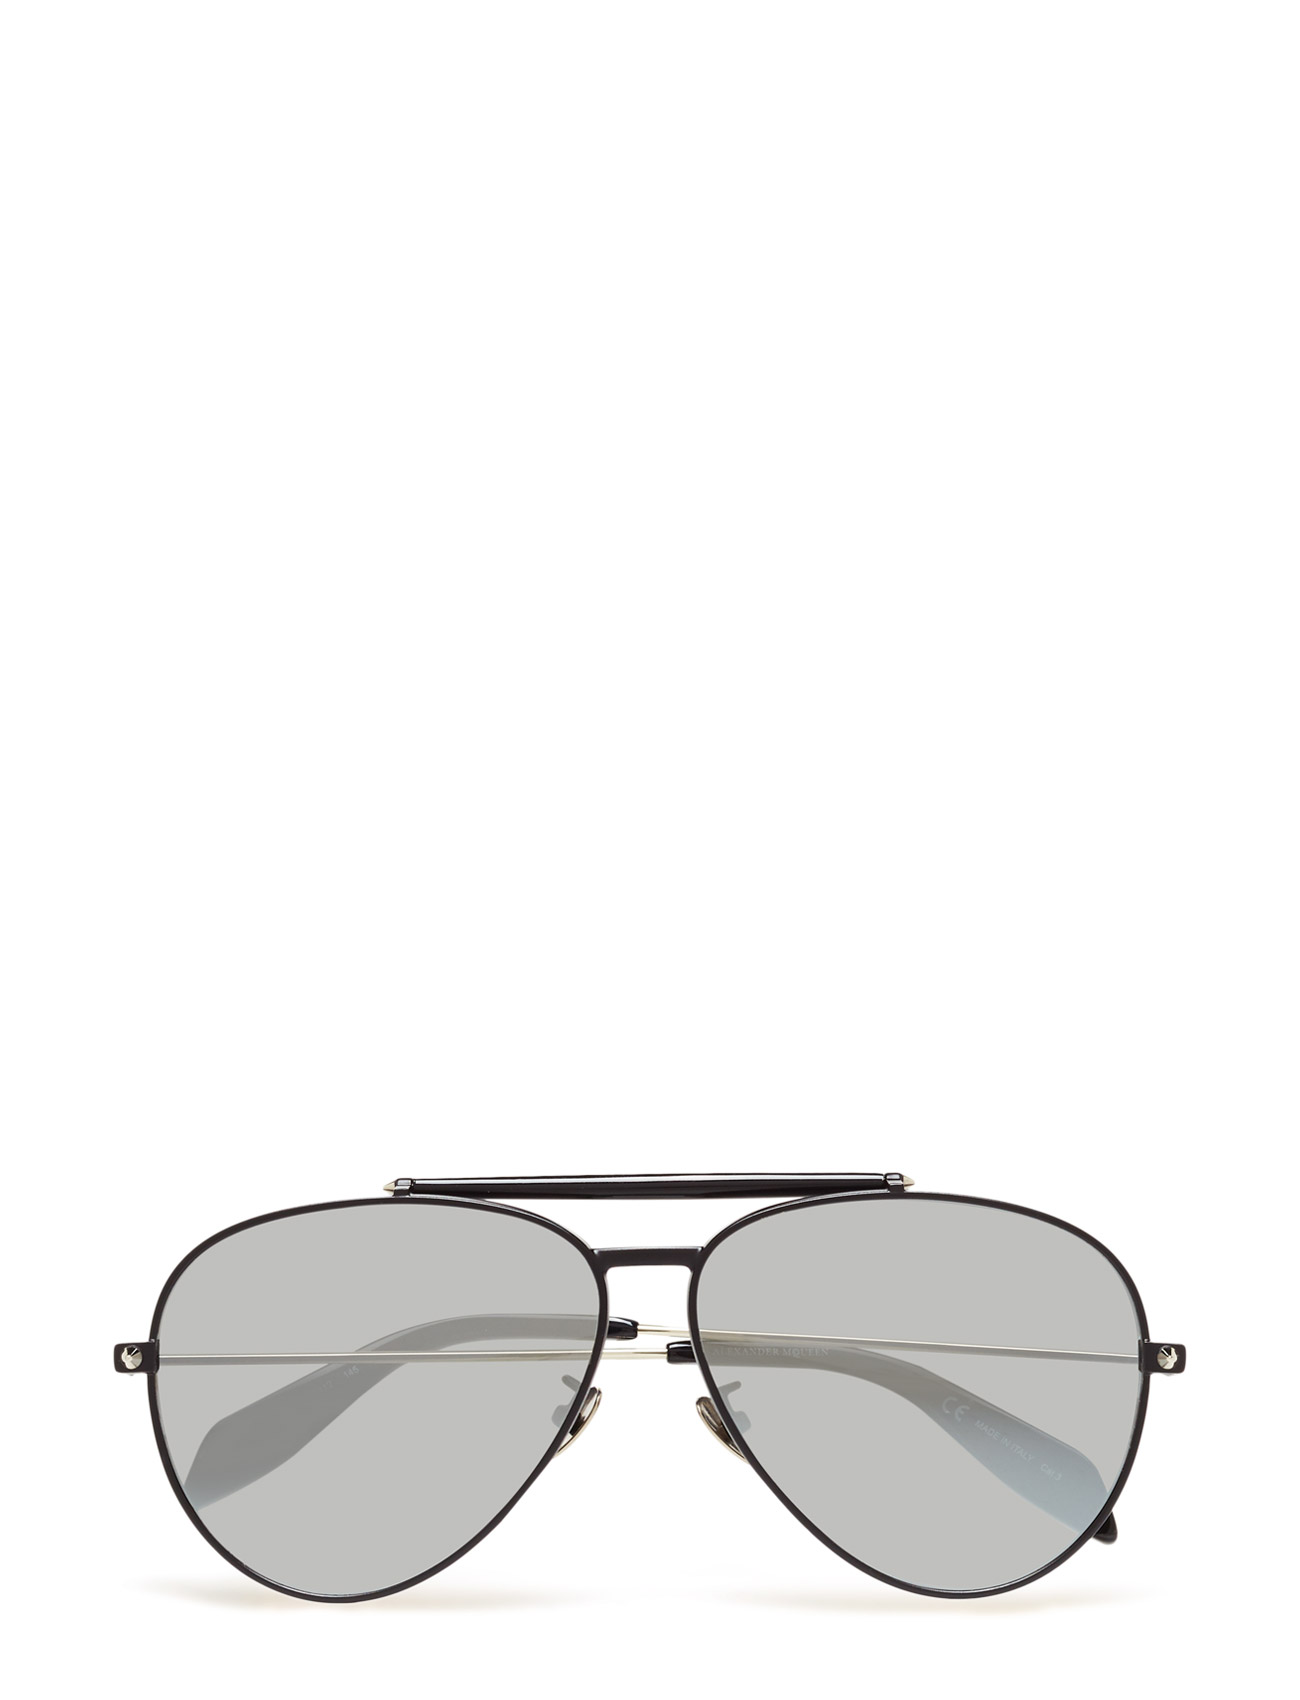 alexander mcqueen eyewear – Am0057s på boozt.com dk